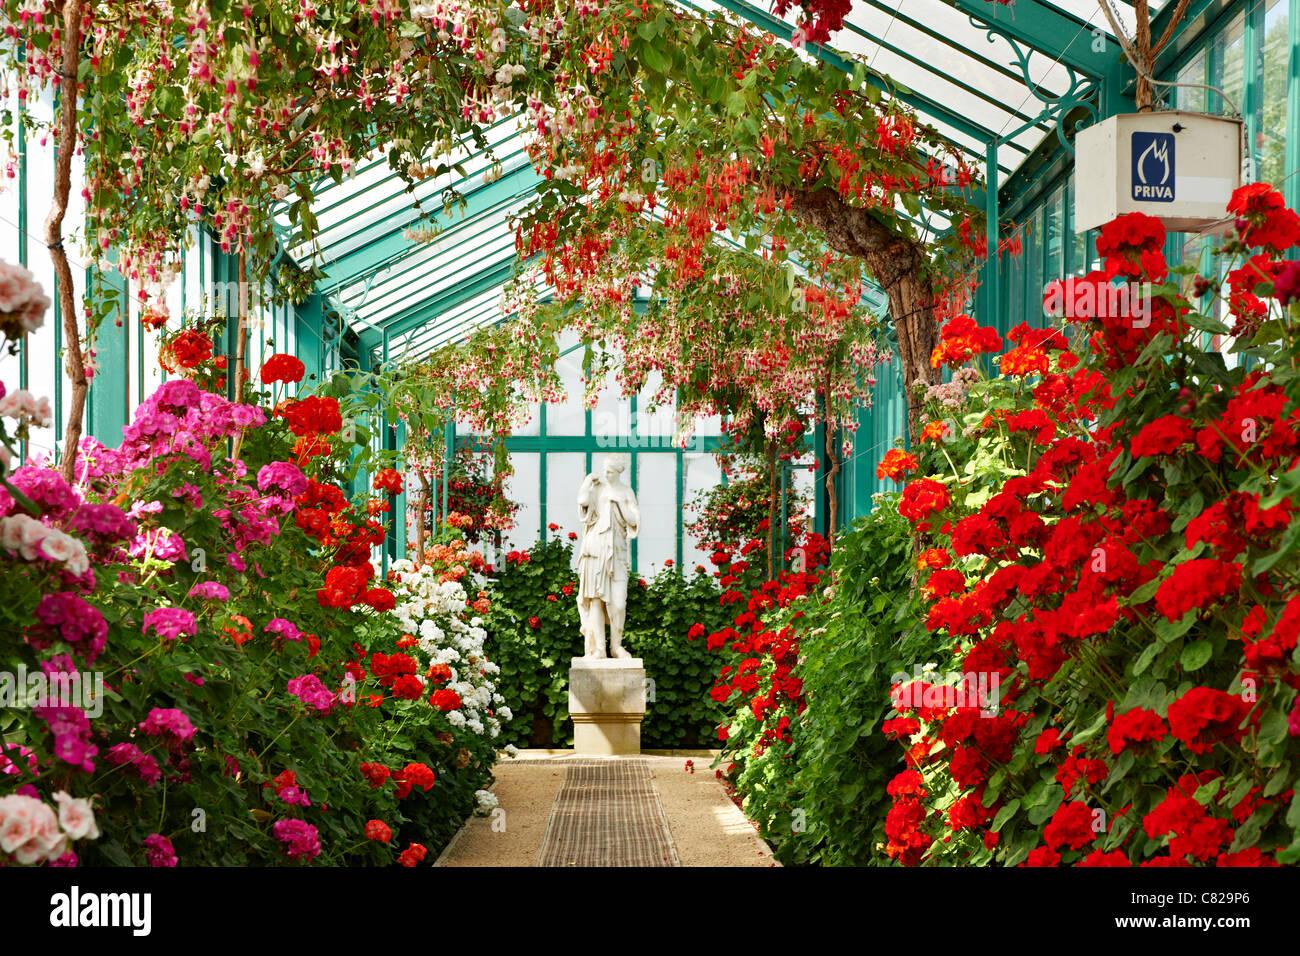 long glass gallery in bloom, Royal Greenhouses of Laeken, Royal Castle of Laeken, Brussels, Belgium, Europe - Stock Image